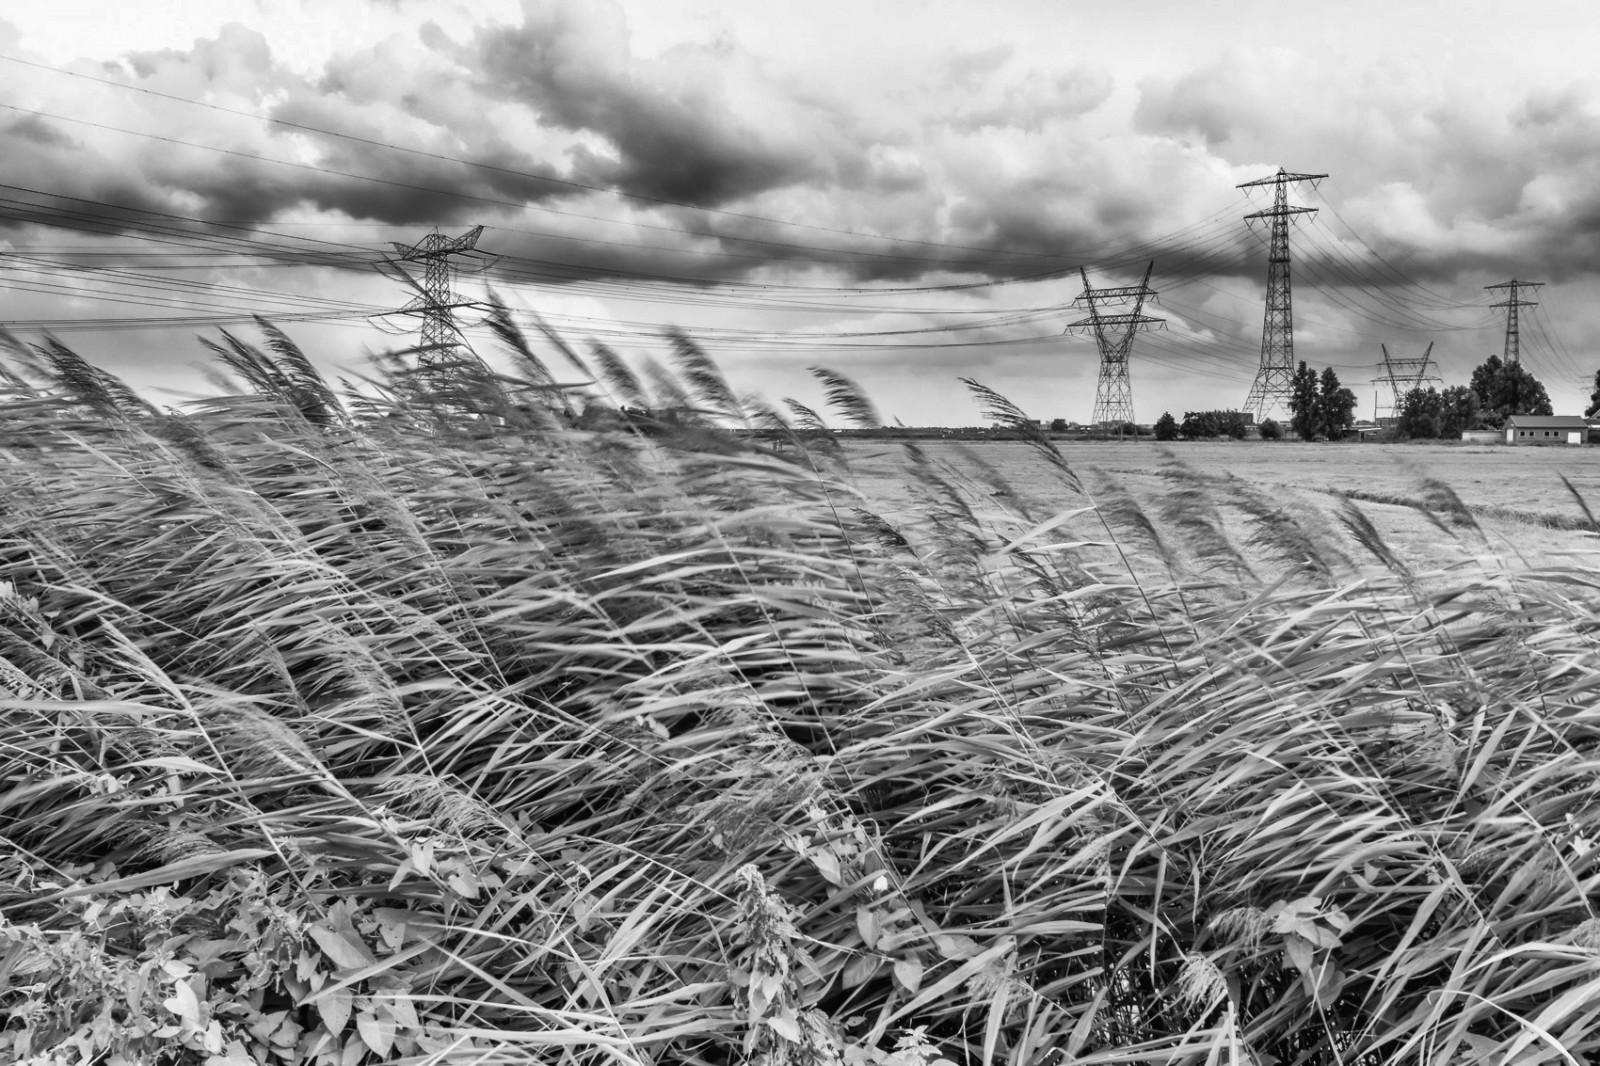 dutchlandscape-stormy-clouds